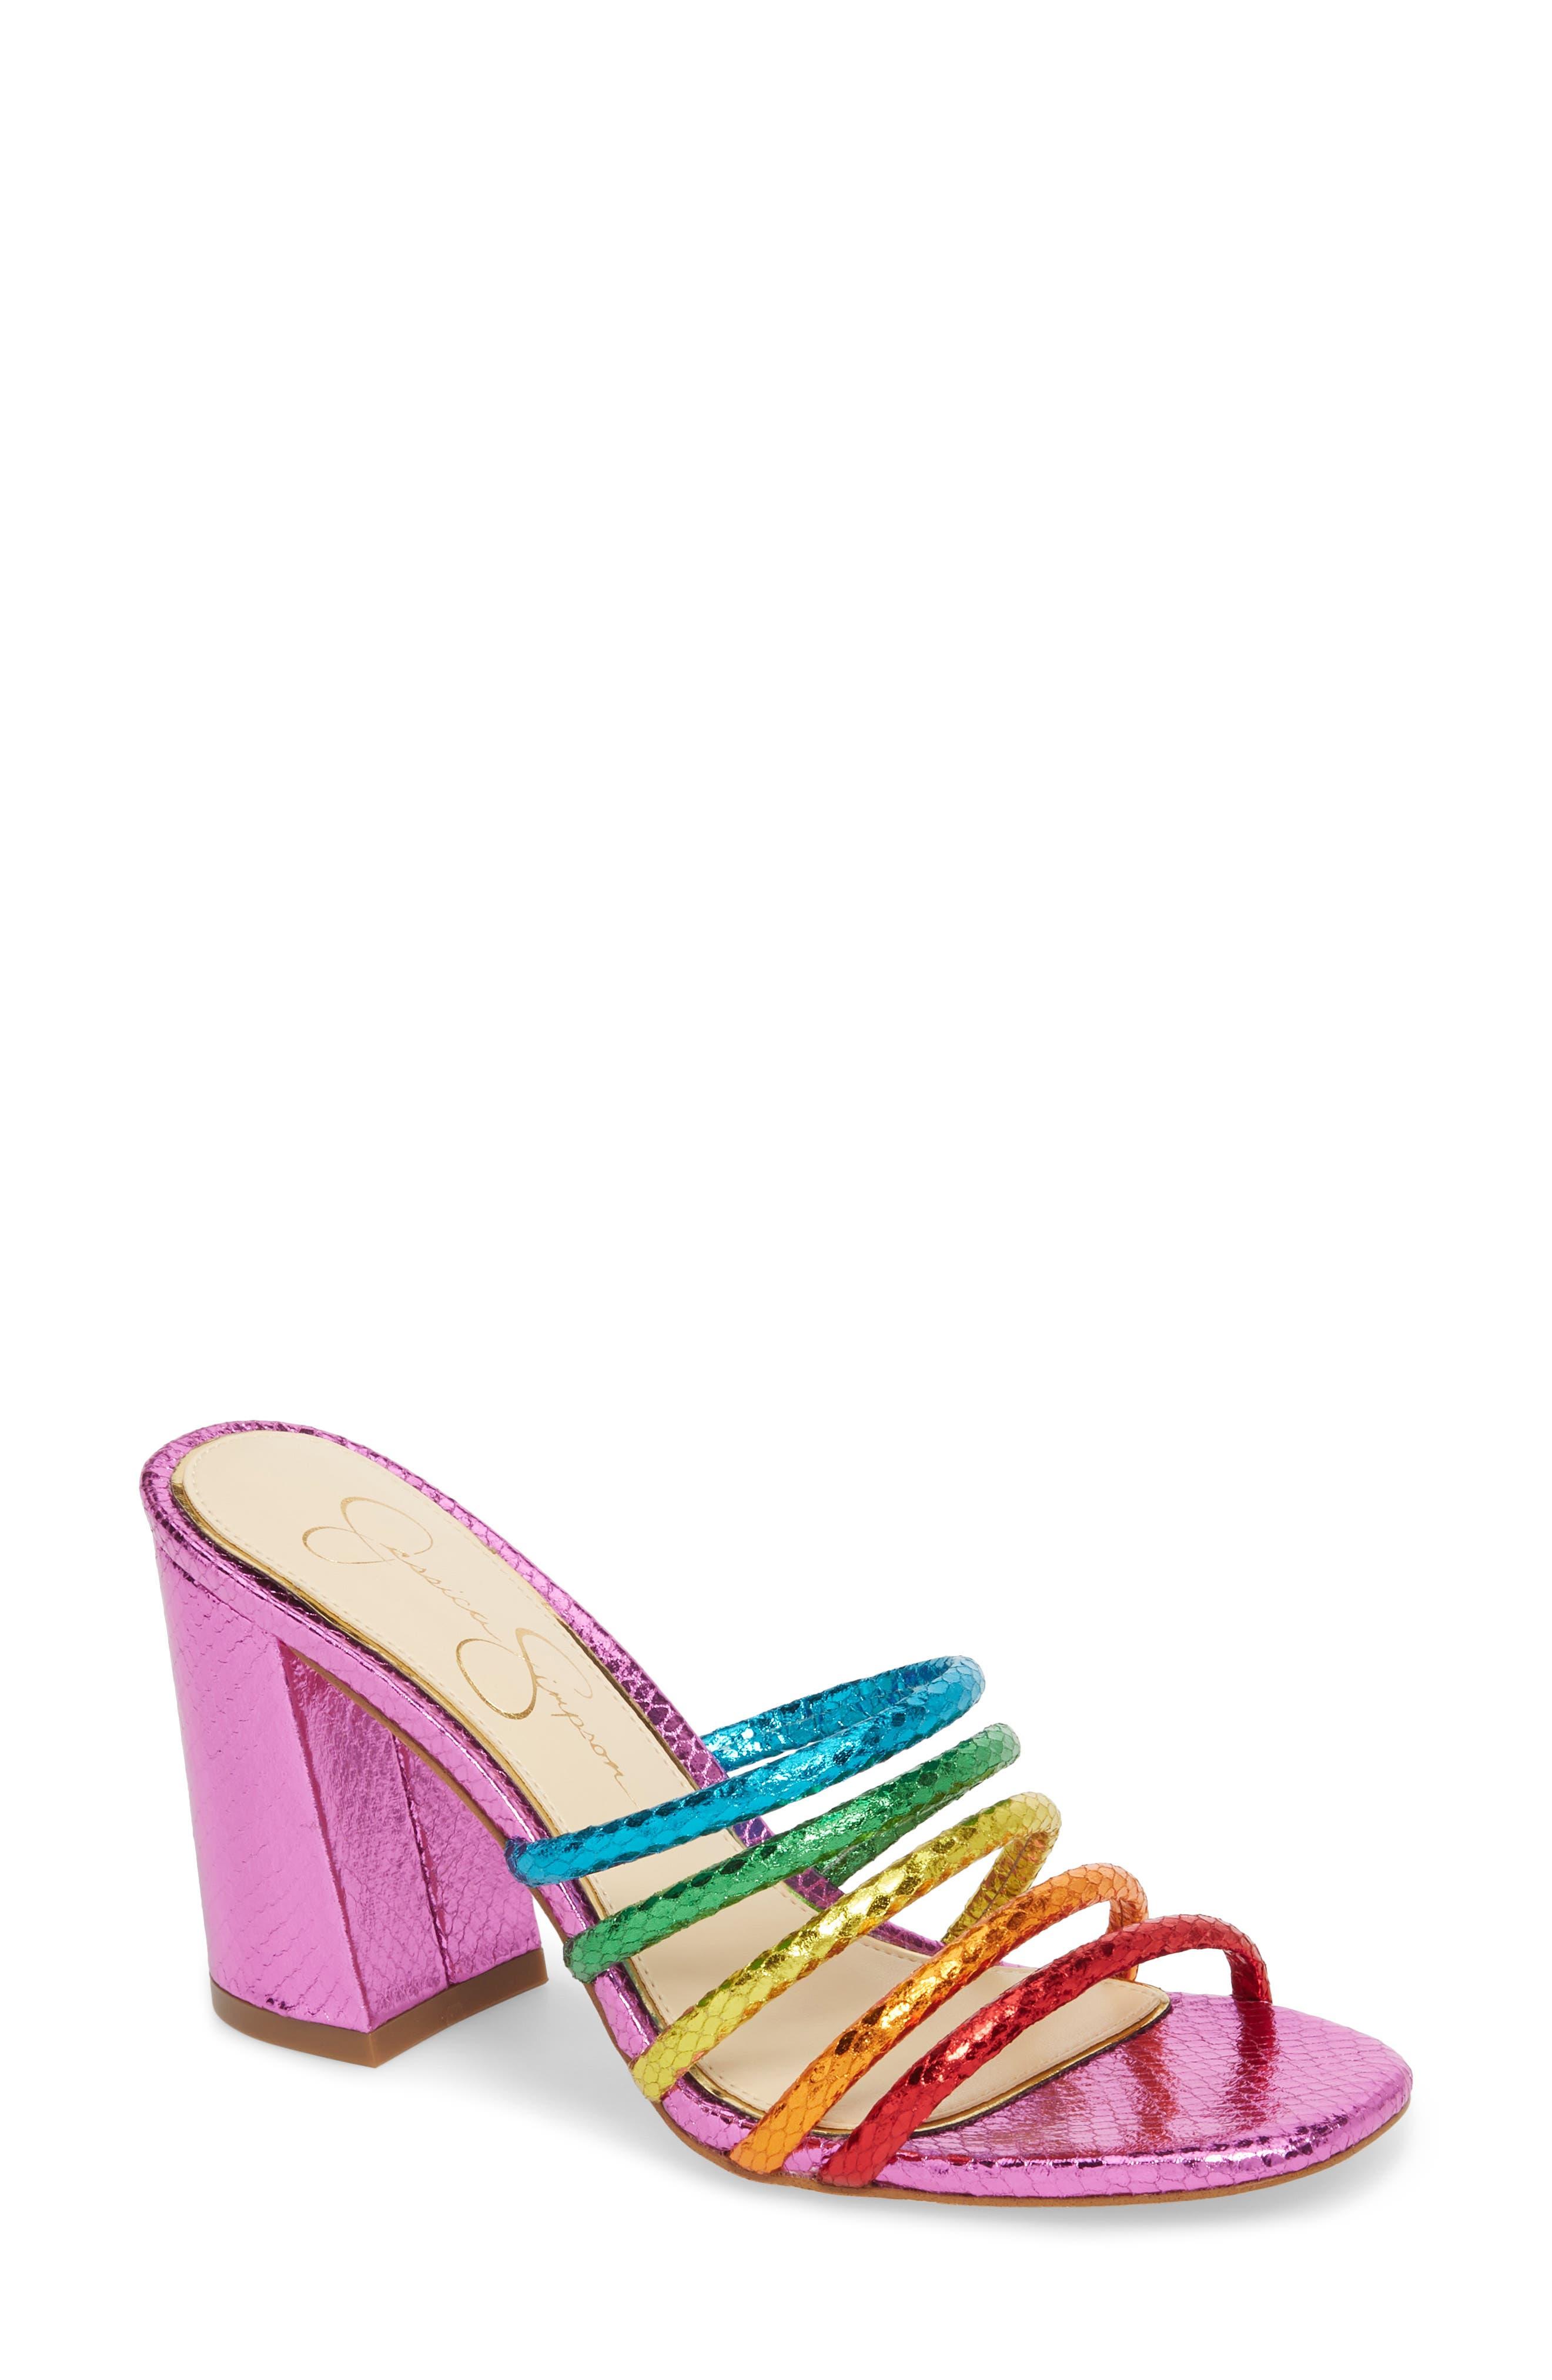 Main Image - Jessica Simpson Fixton Strappy Slide Sandal (Women)